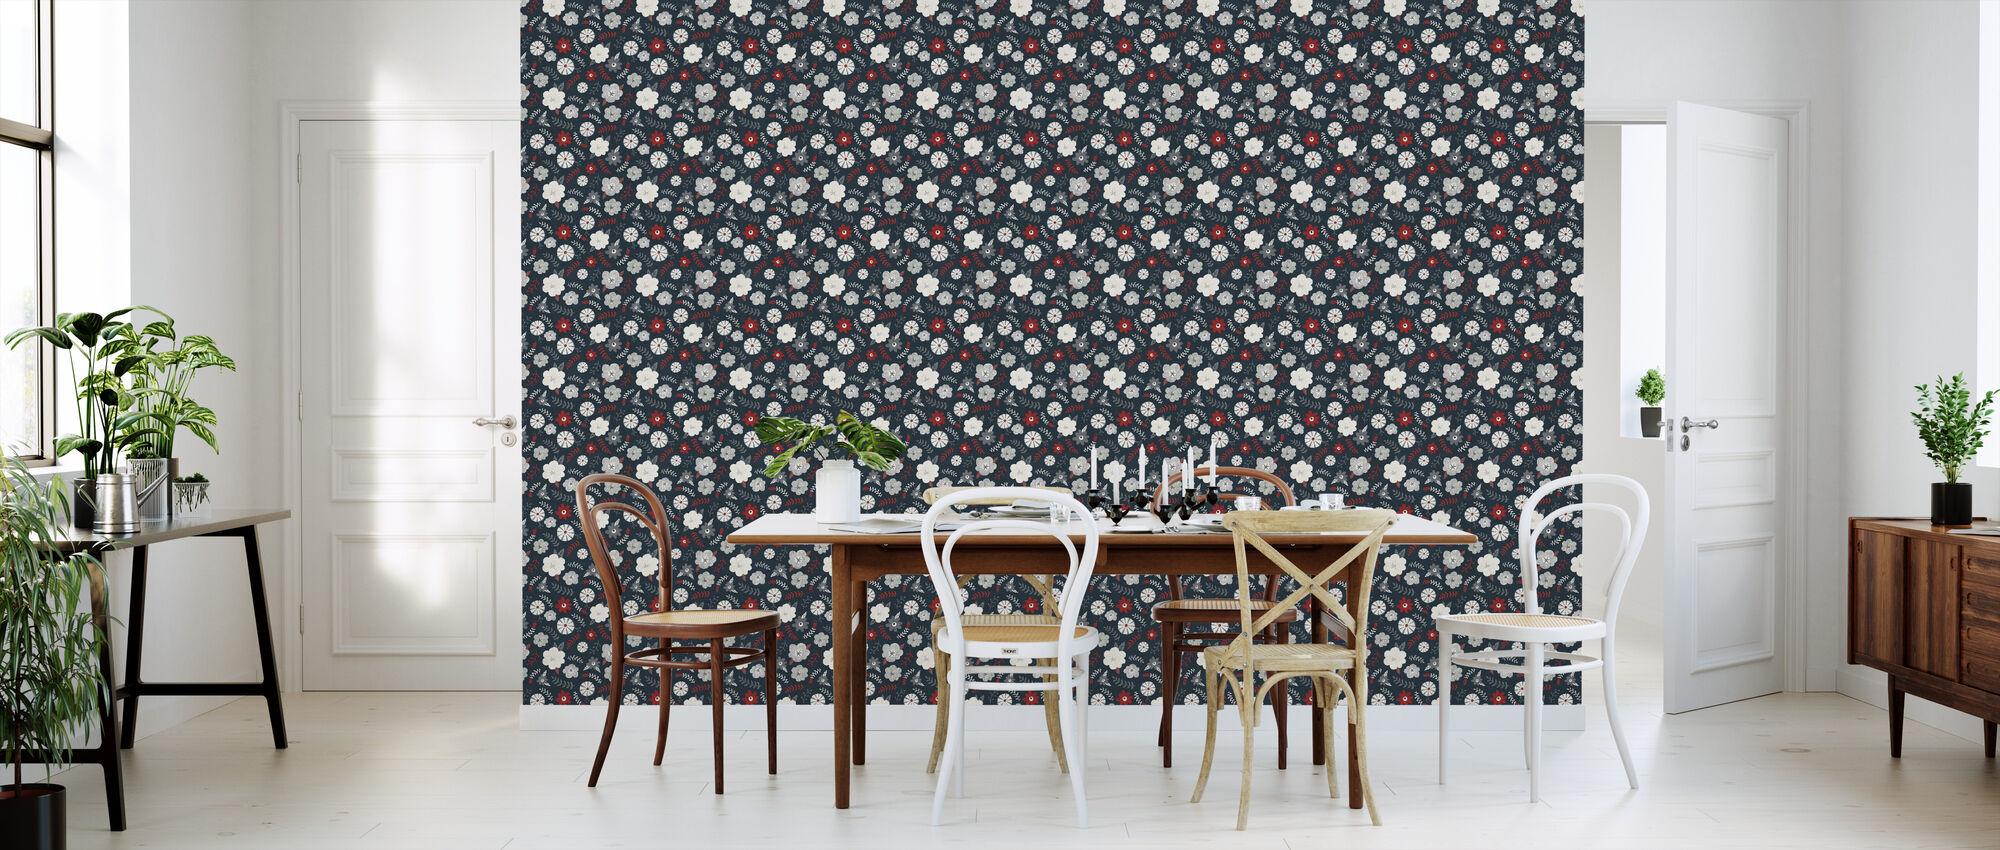 Mullan Vintage Bouquet 4 - Wallpaper - Kitchen